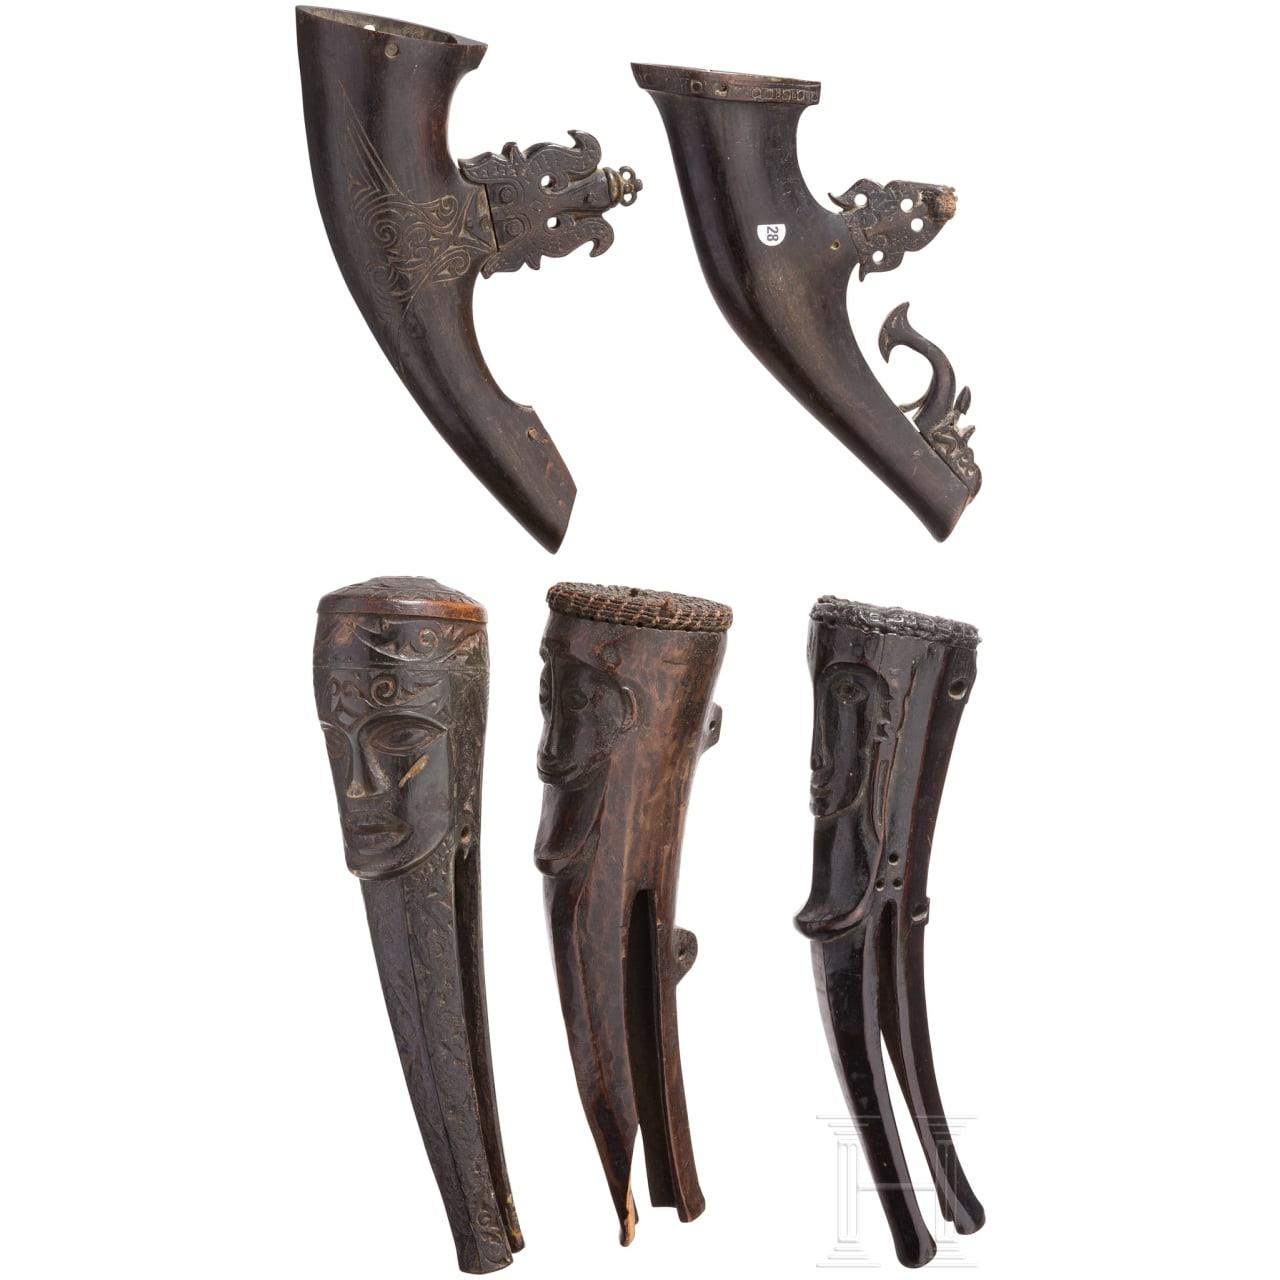 Two Indonesian wooden powder horns and three bullet horns, Batak, Sumatra, 18th century